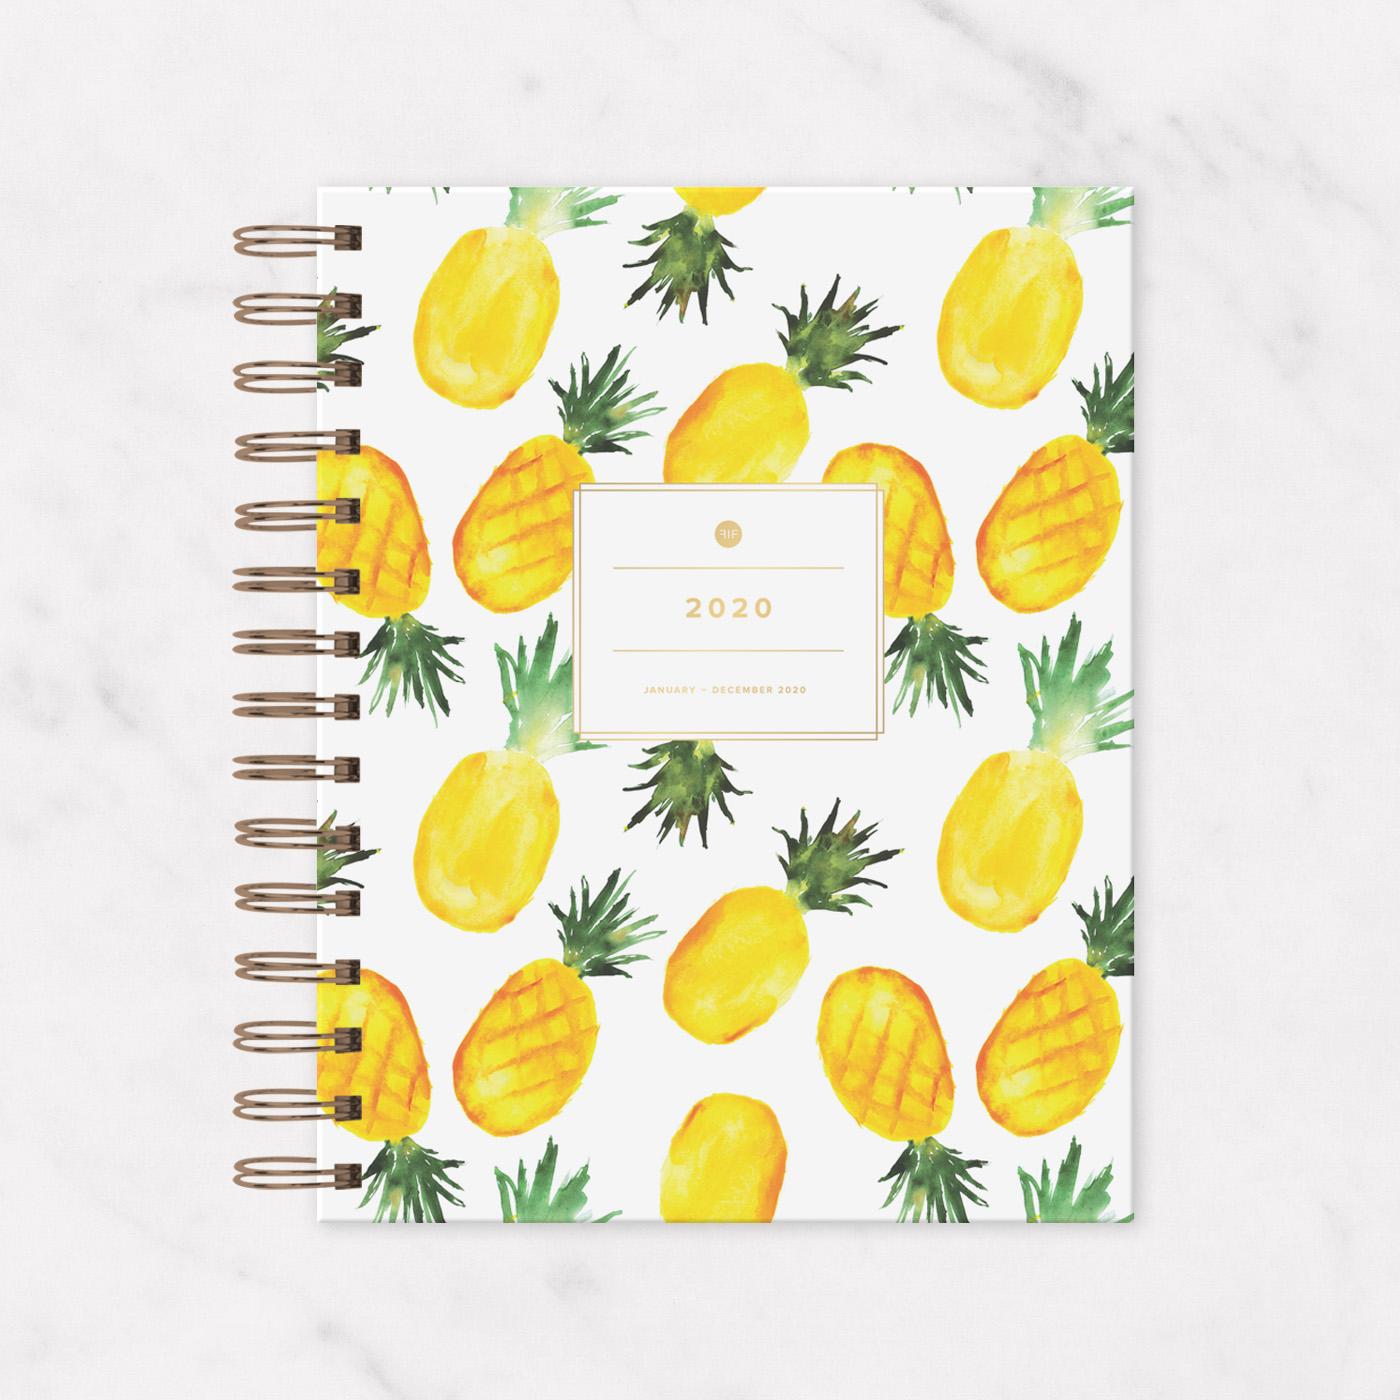 2020 IVF Planner Pineapple